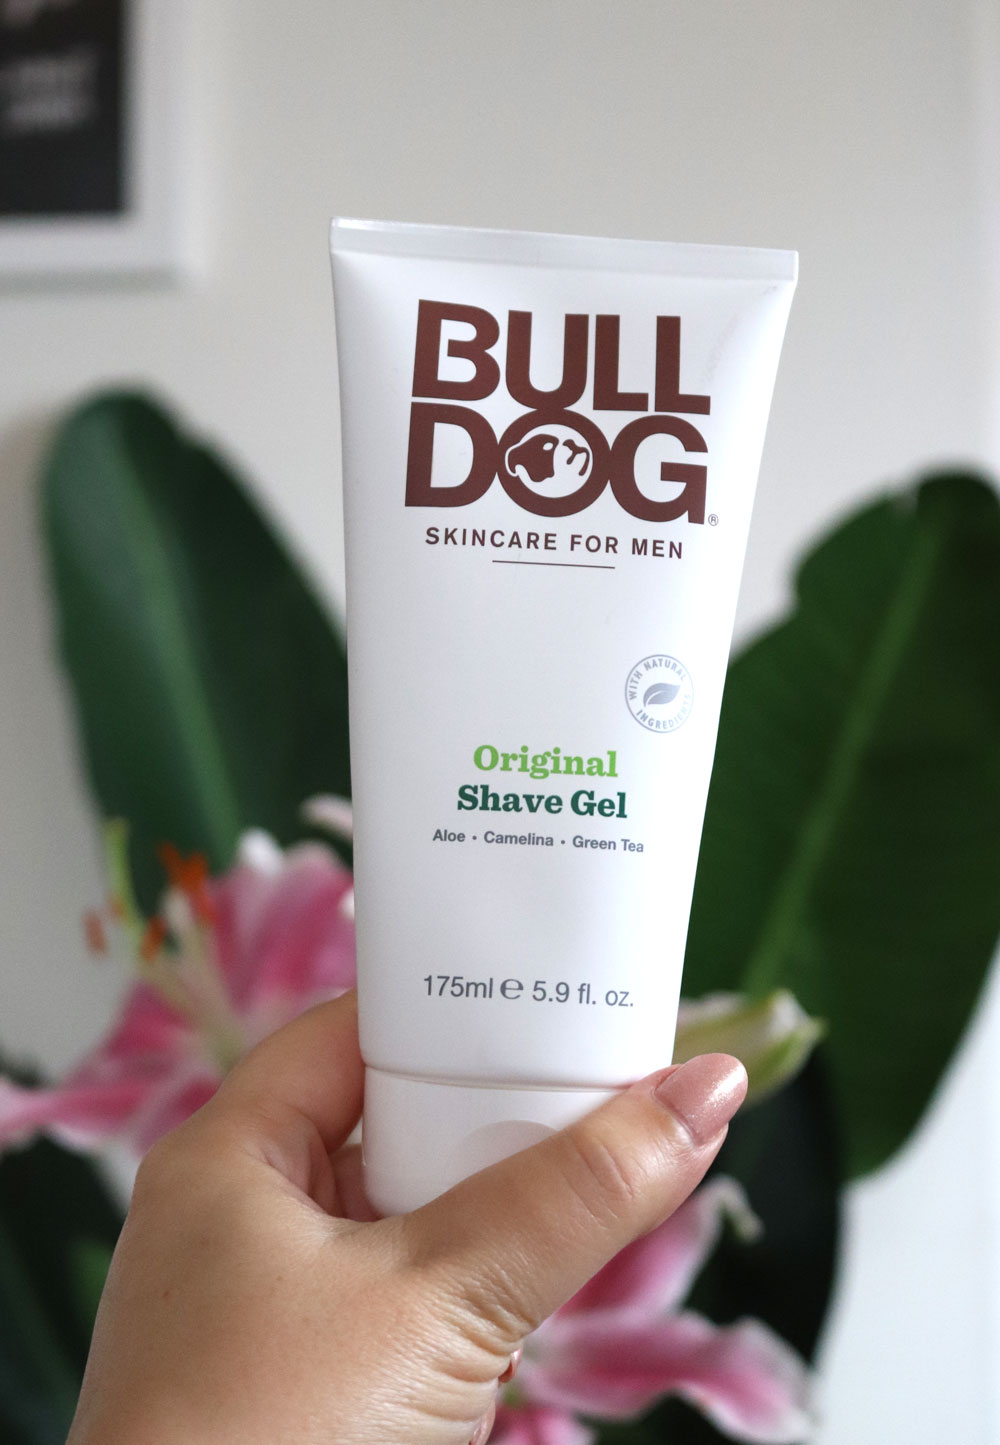 Bulldog shave gel at iHerb